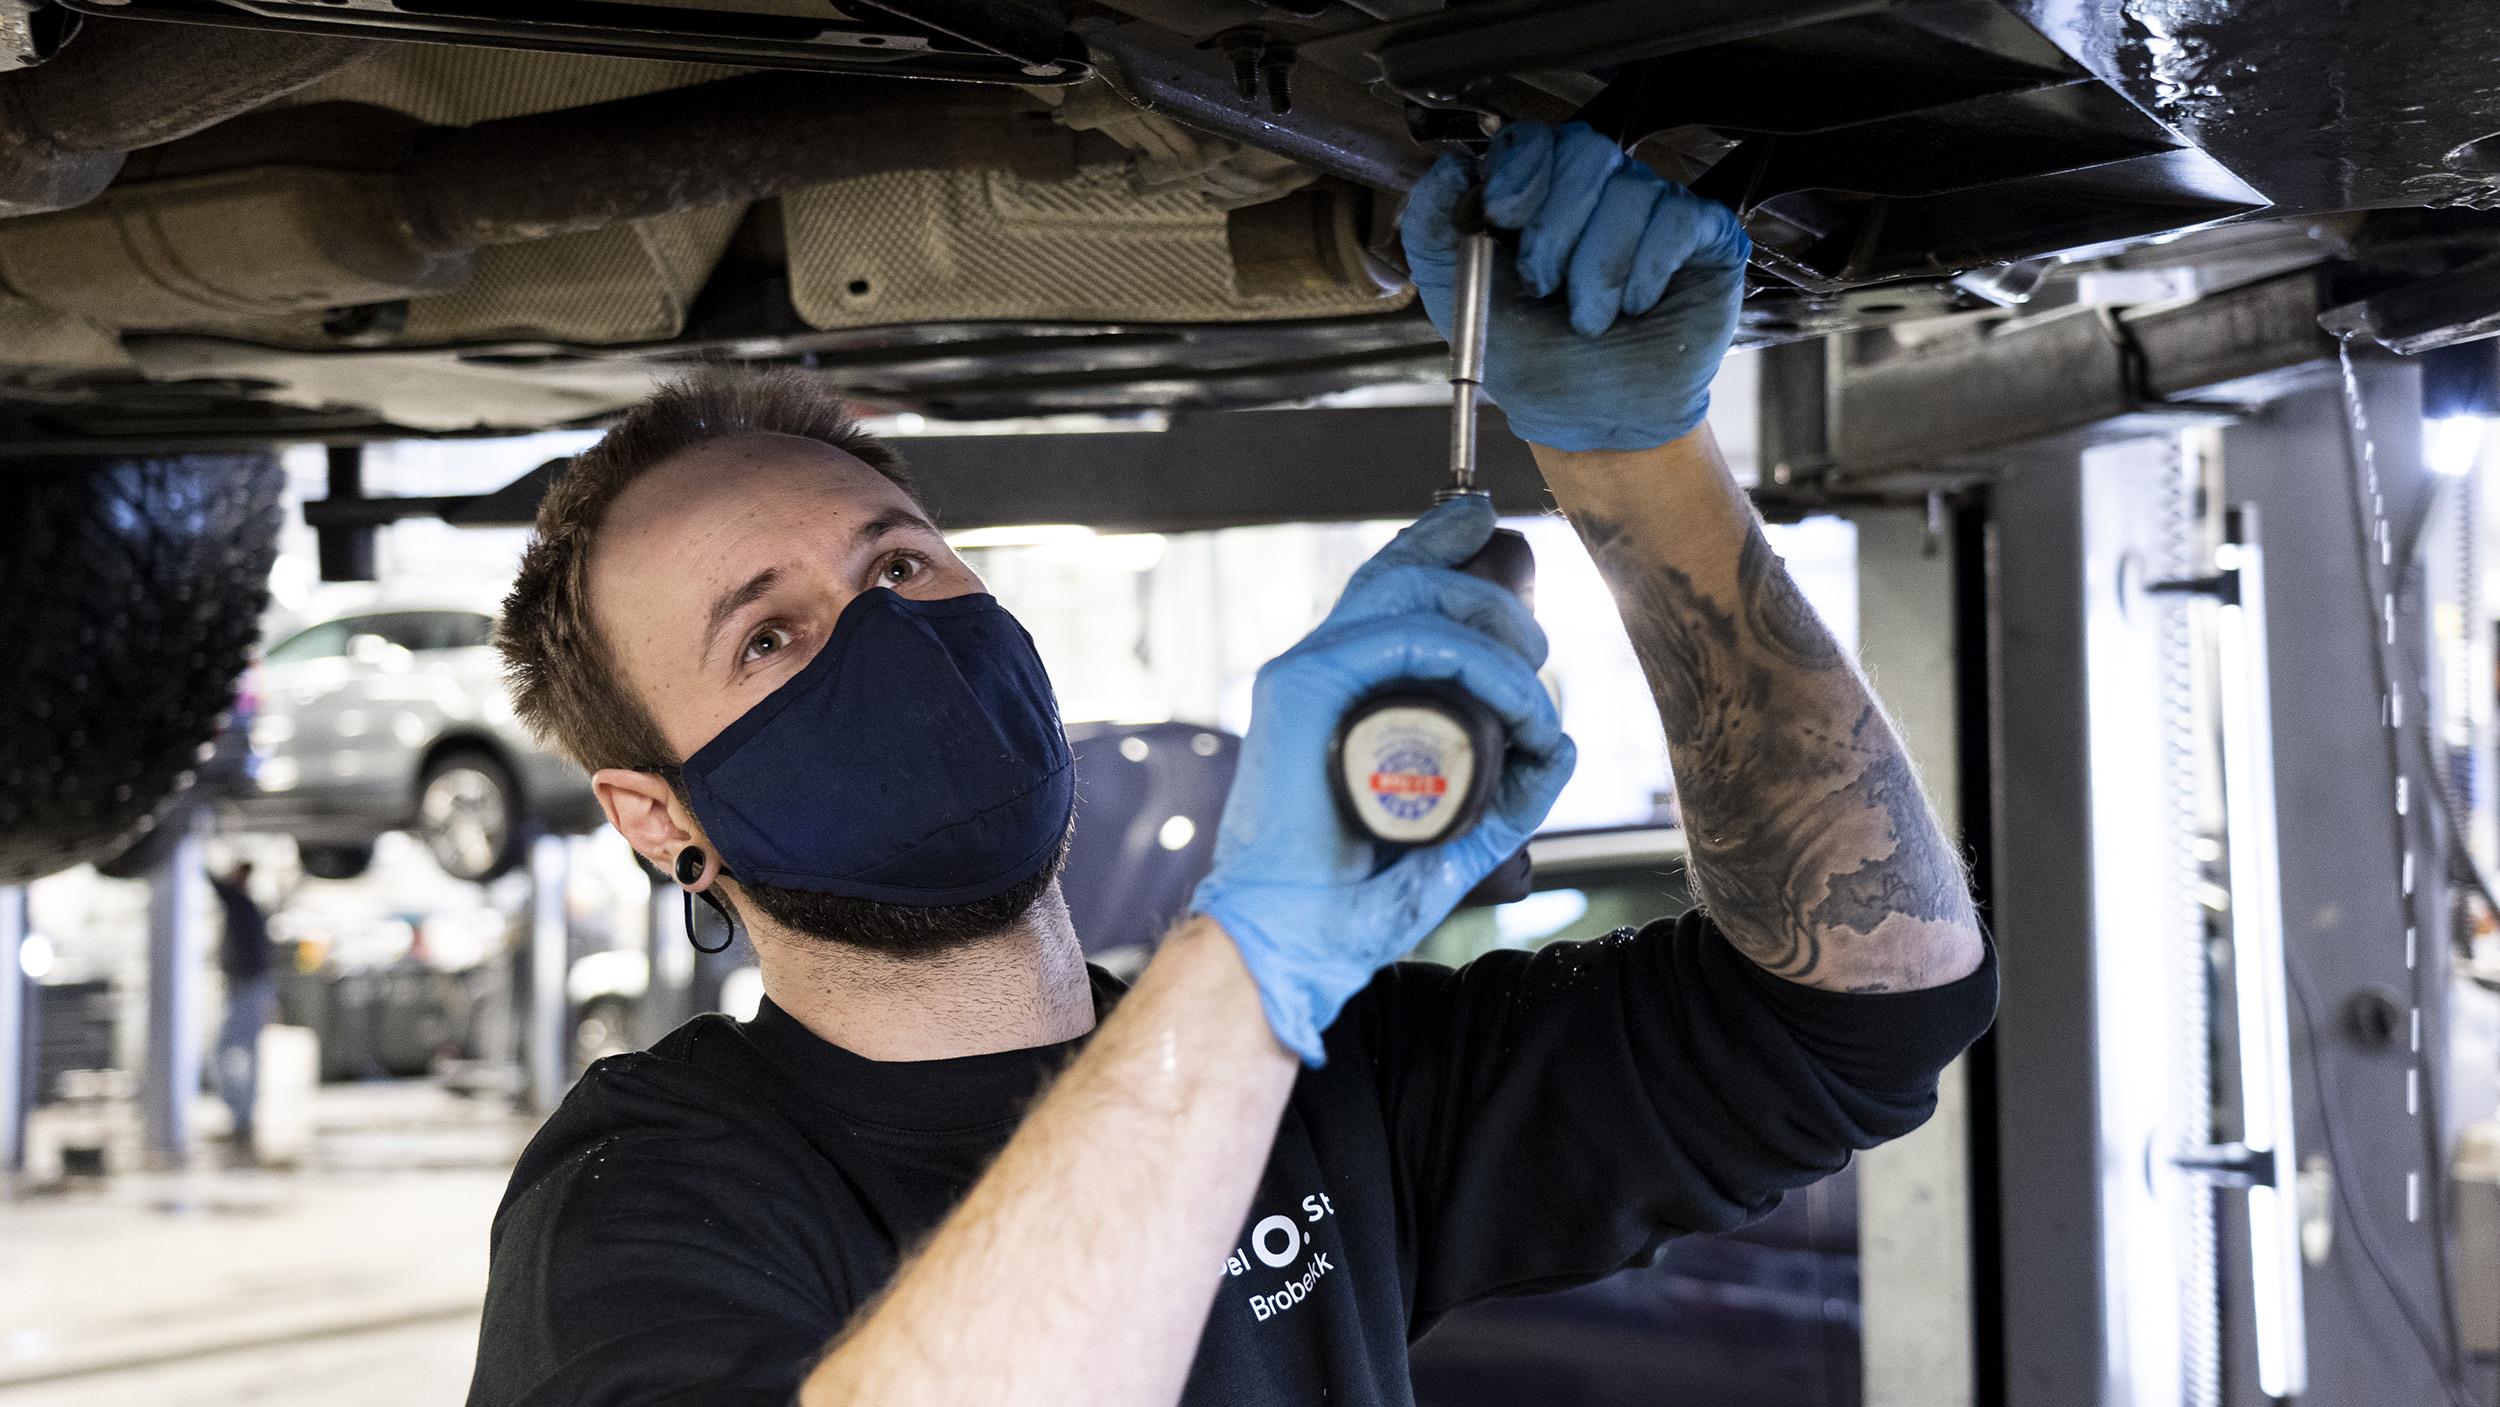 Bilmekaniker arbeider under en bil